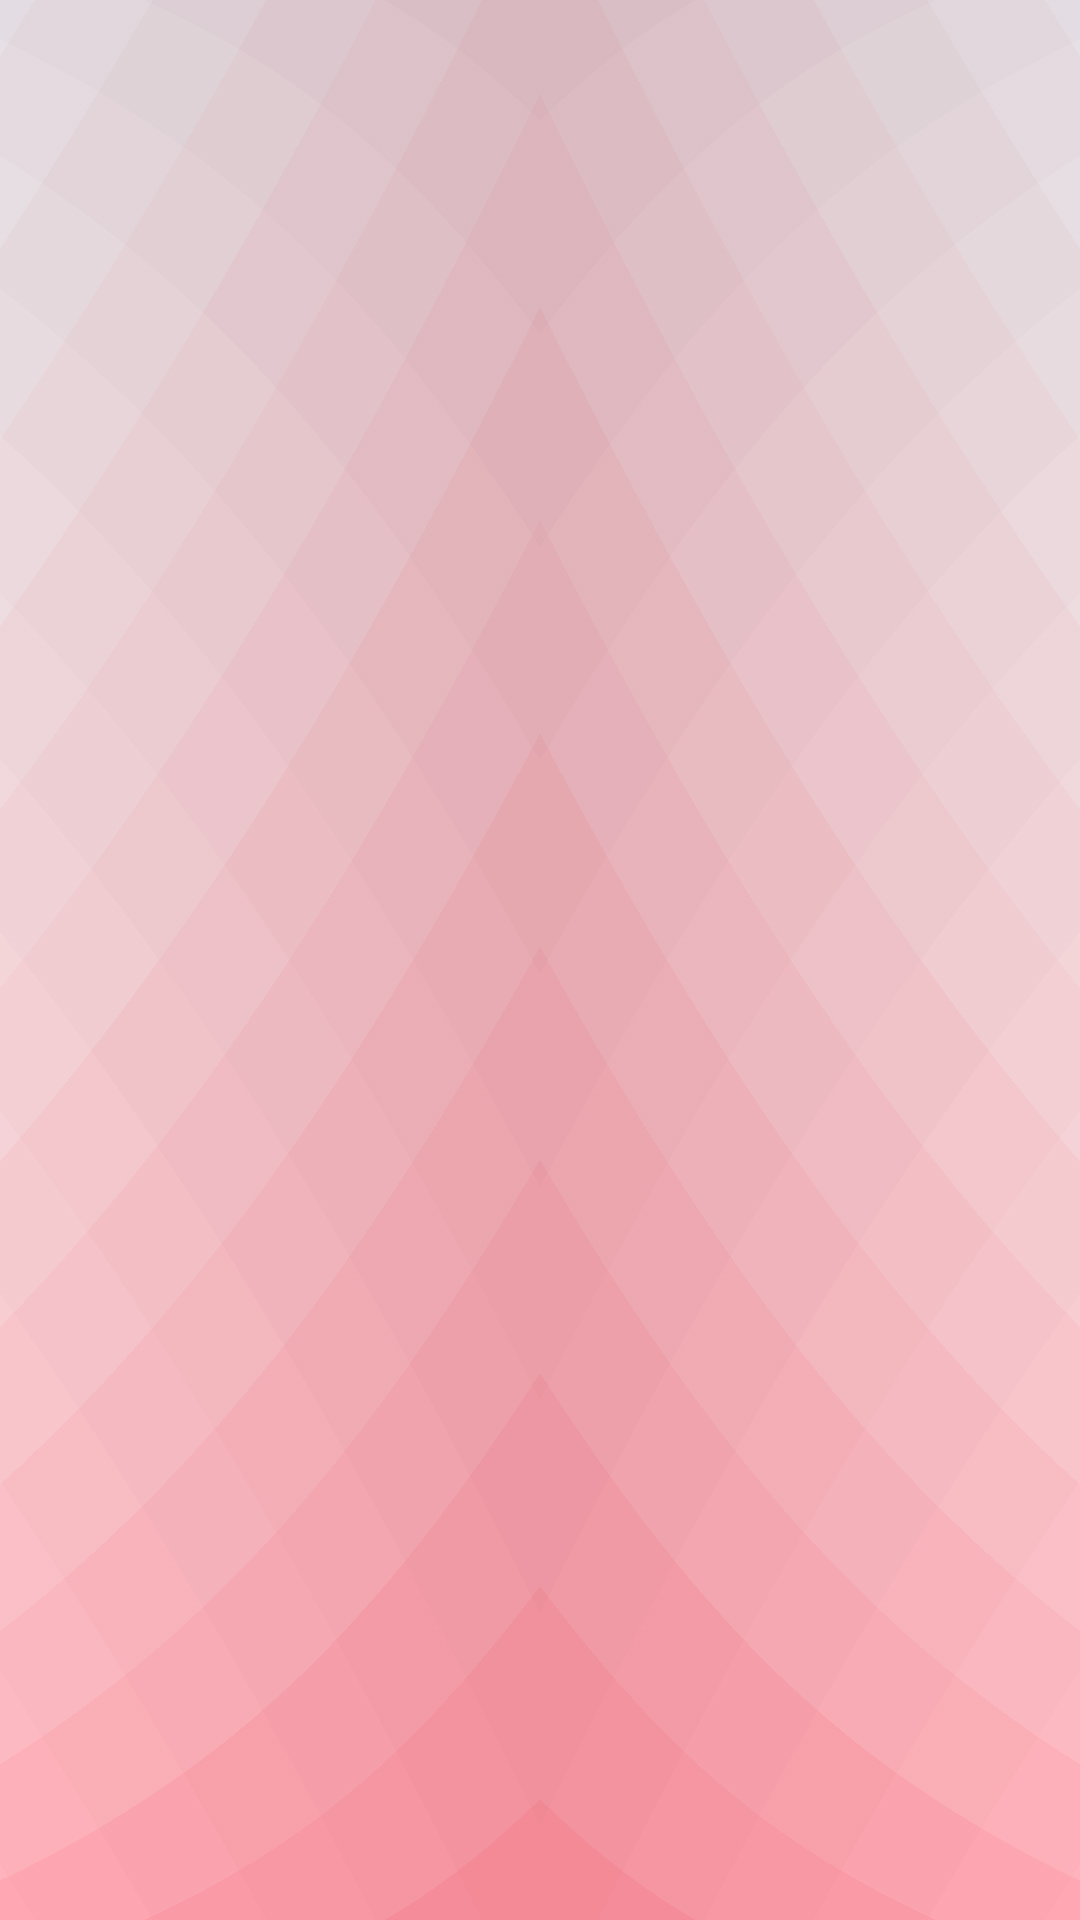 iPhone 7 Plus 壁紙